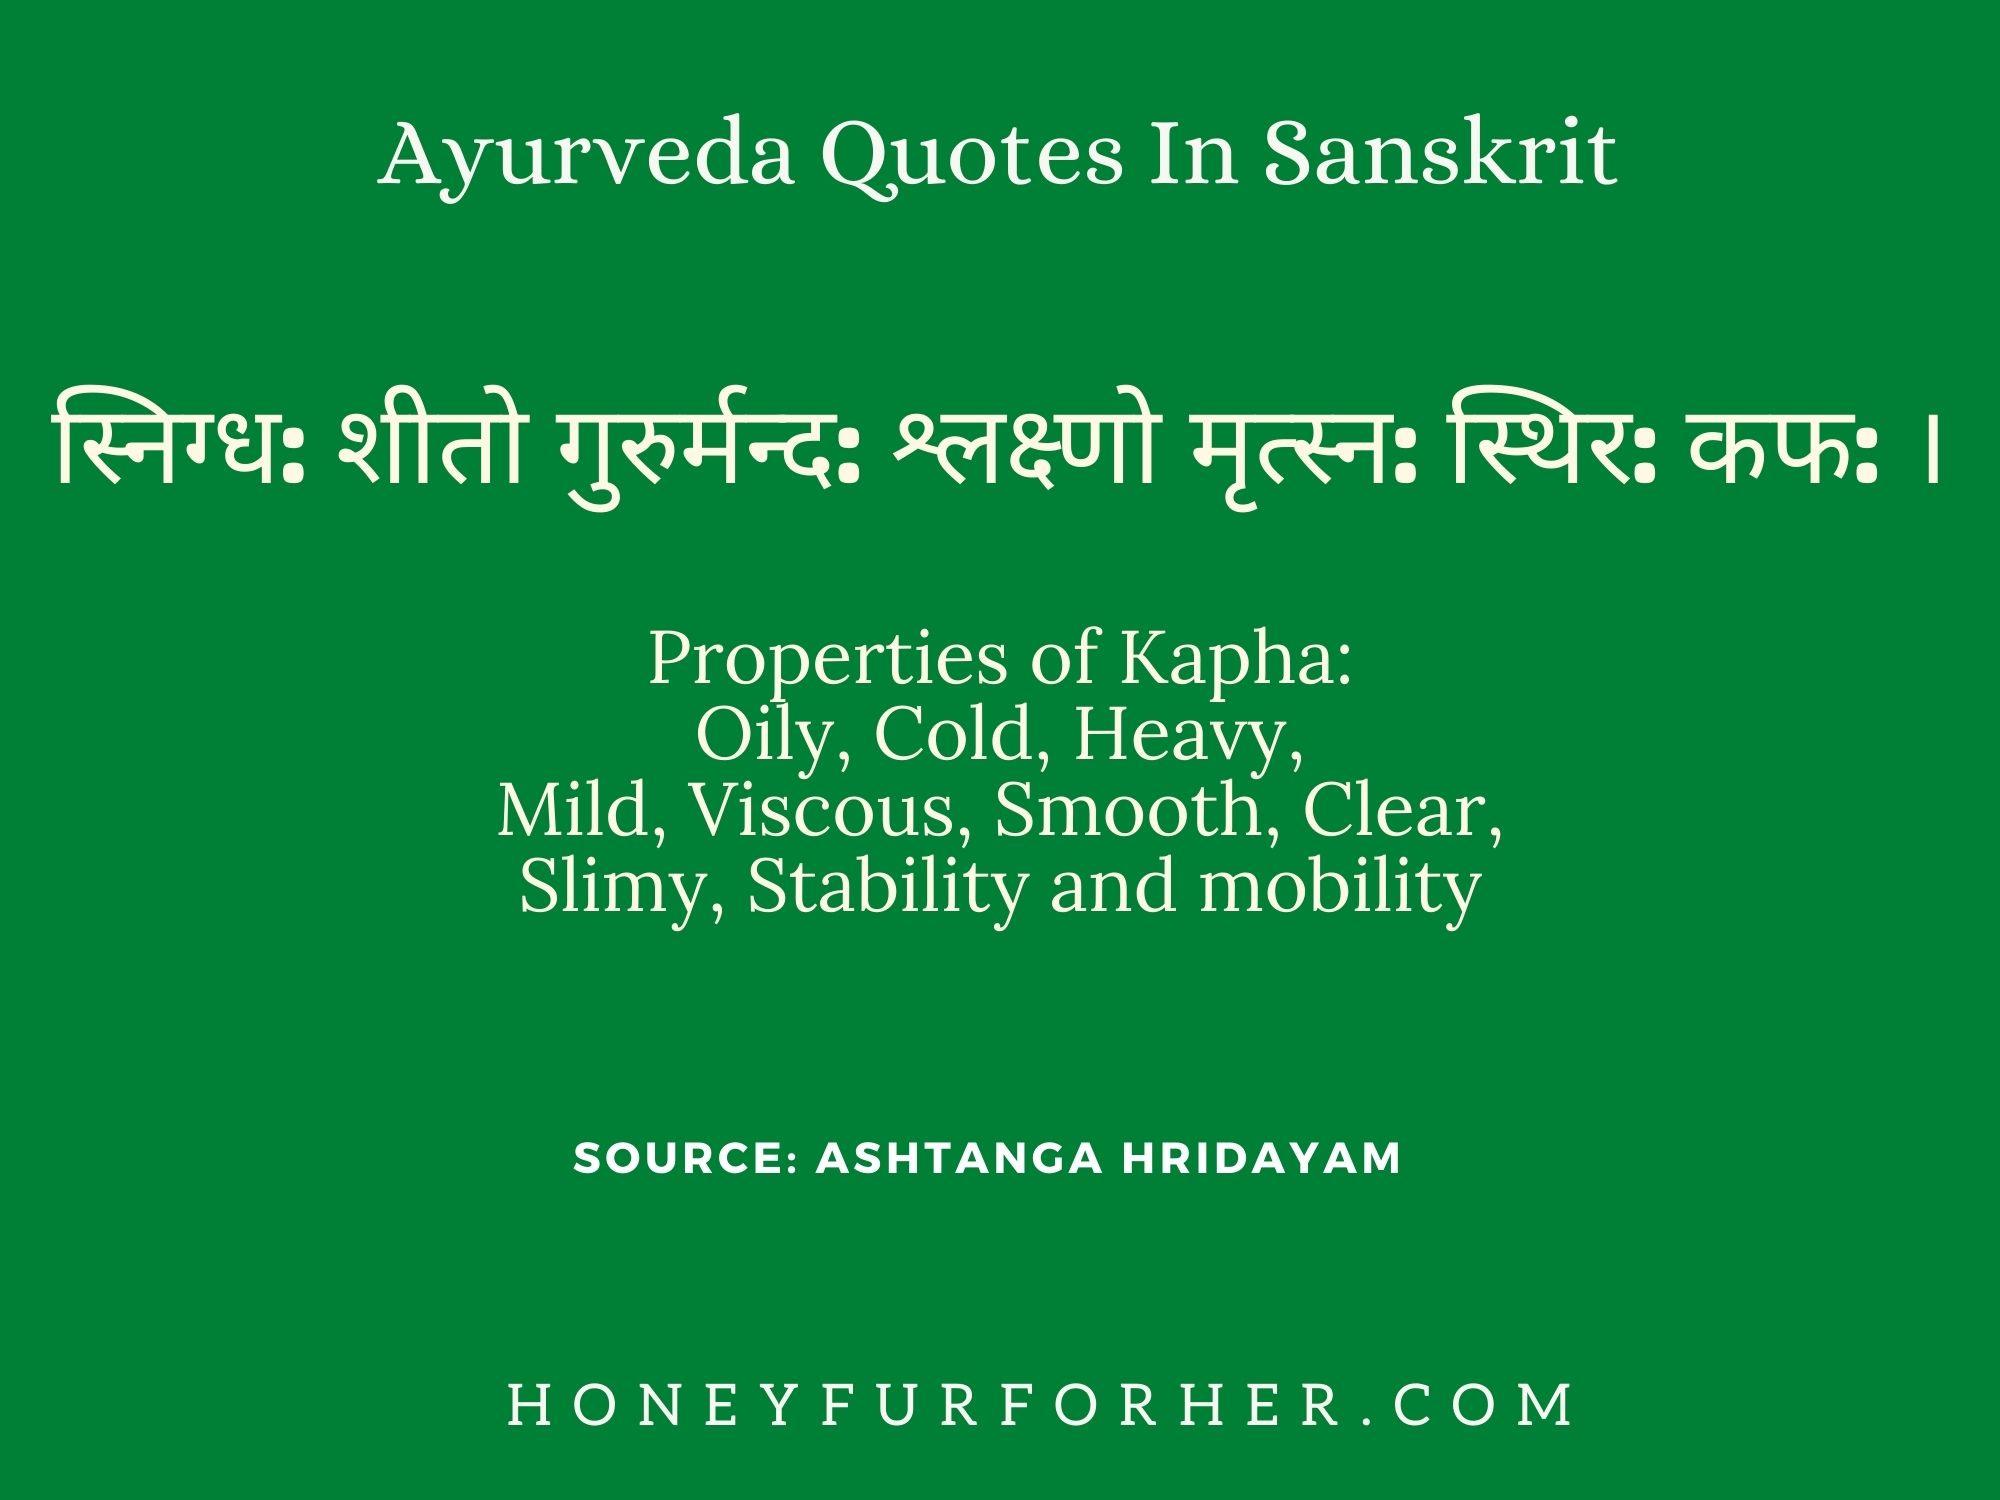 Ayurveda Quotes 10